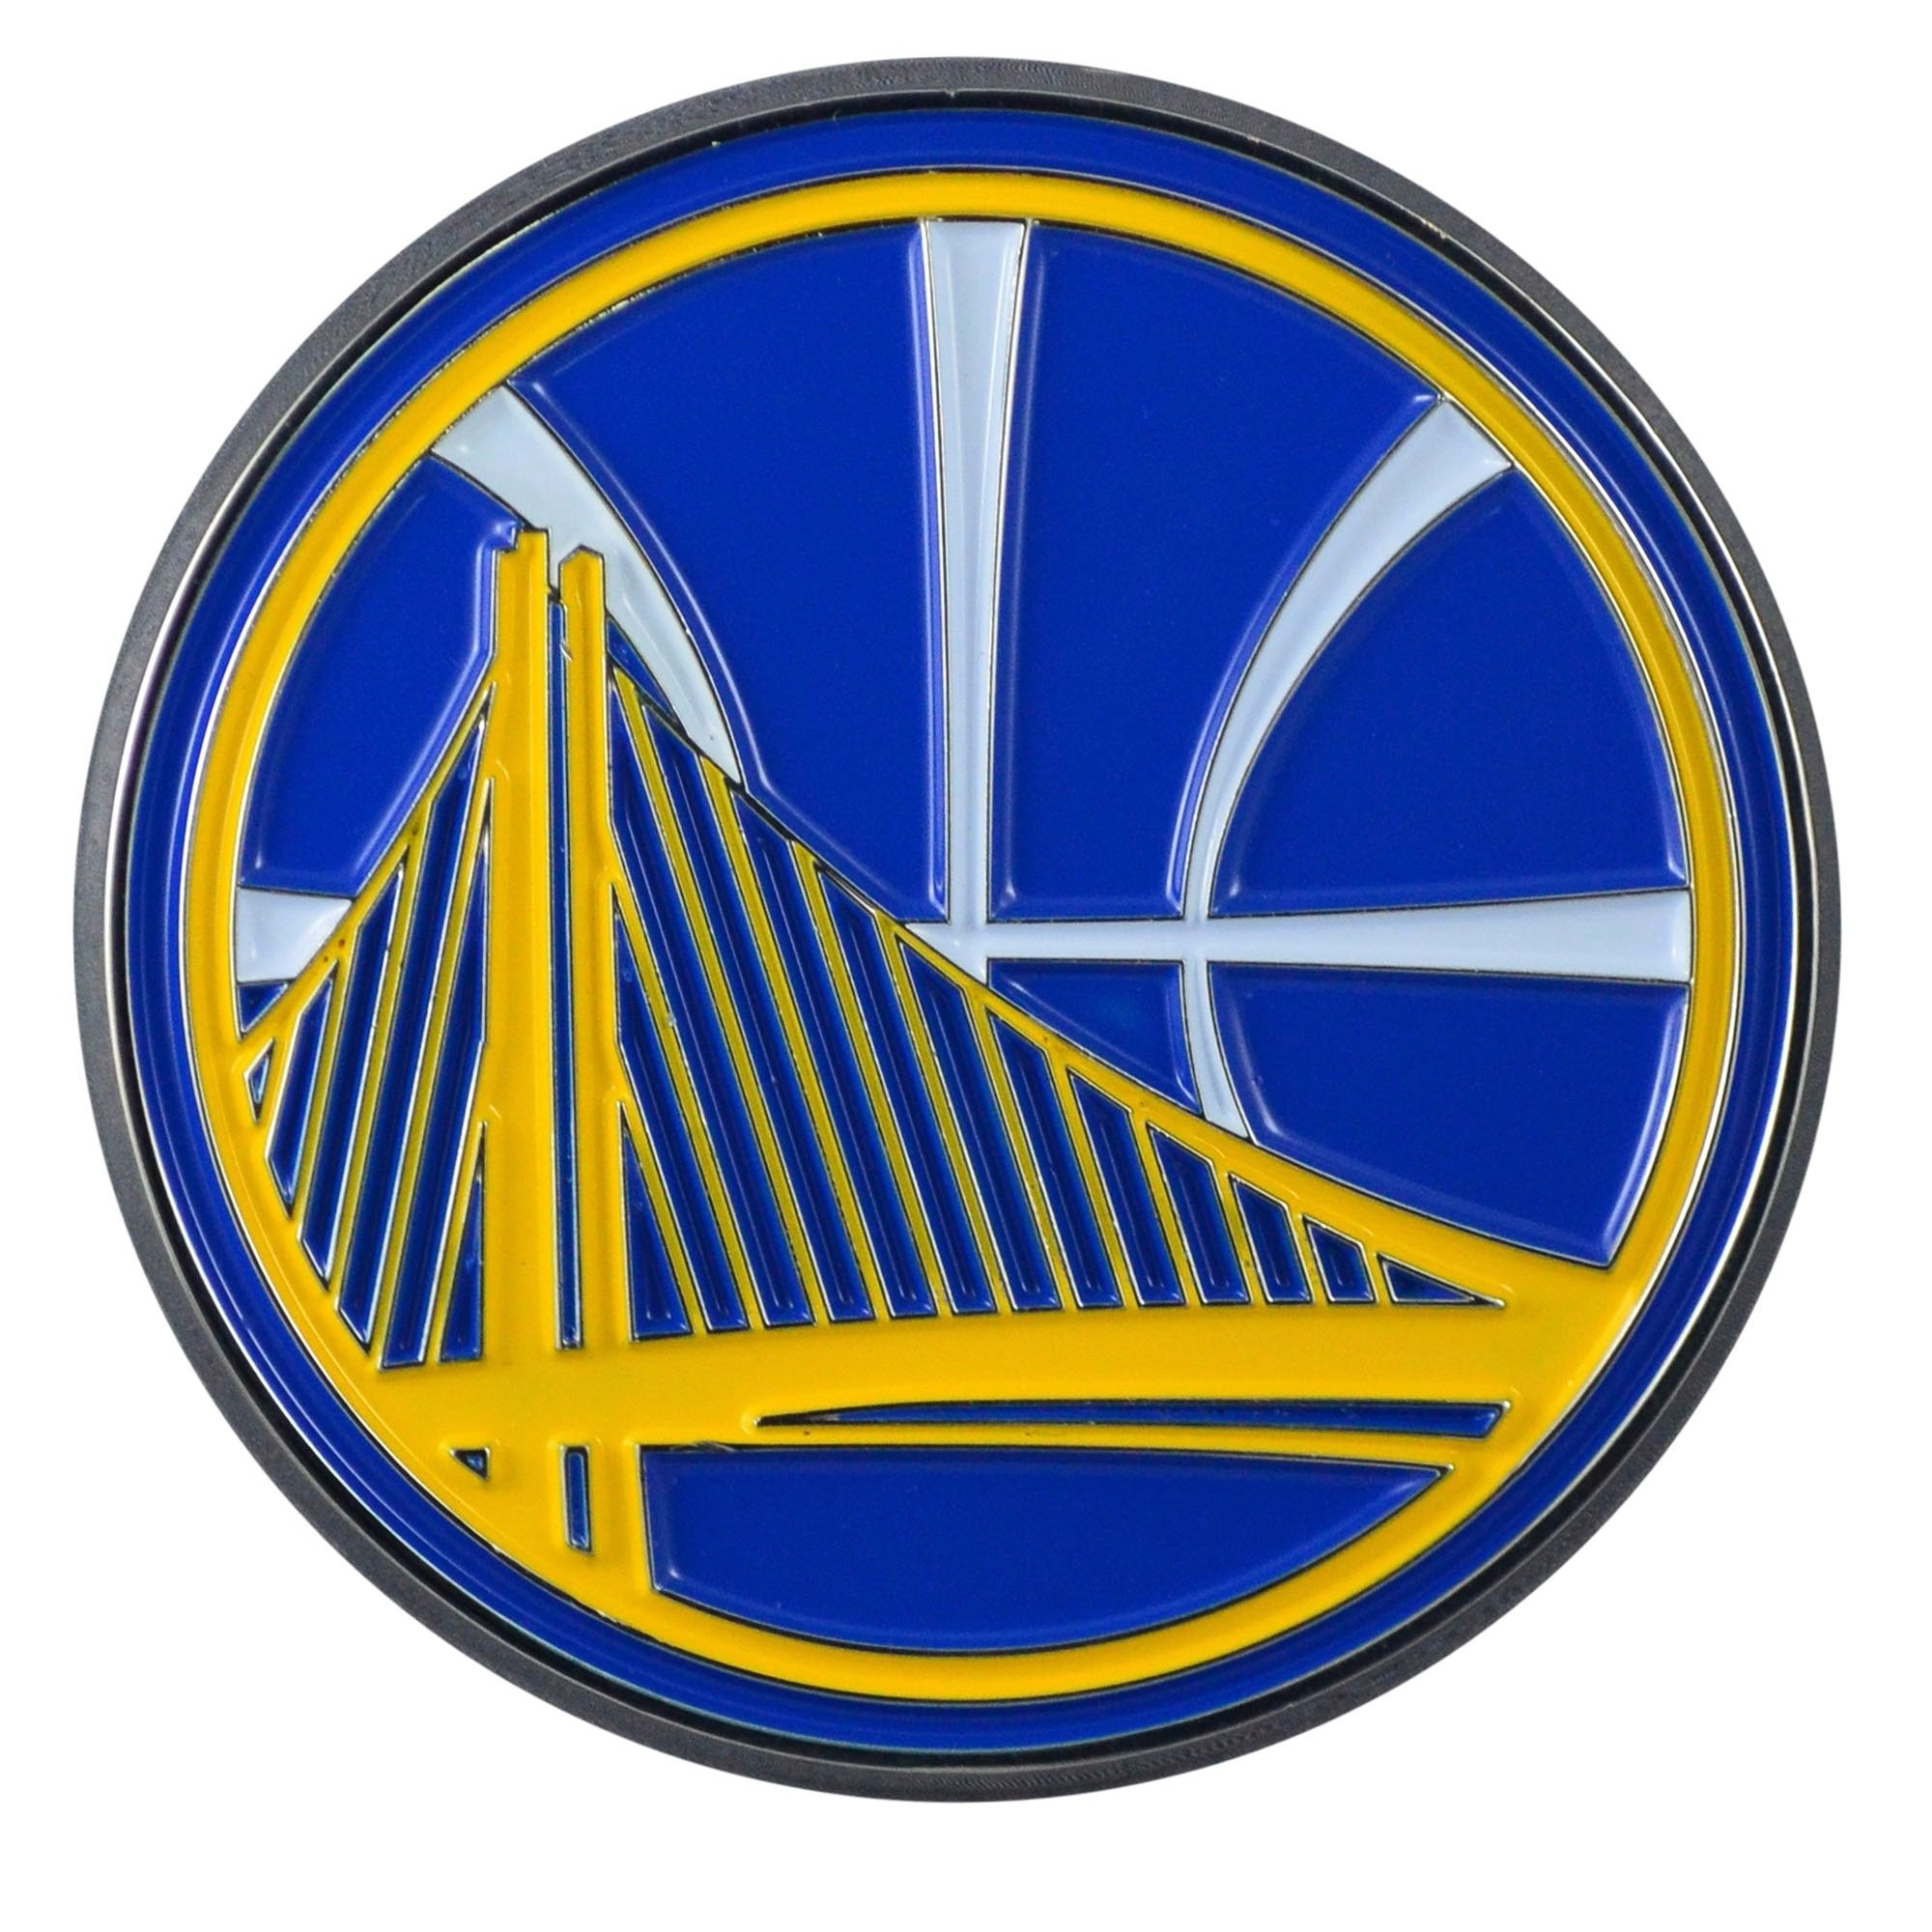 Furniture Stickers Home, Furniture & DIY Golden State Warriors Logo Wall Decal Window Decor Sticker Sports Vinyl GSW NBA